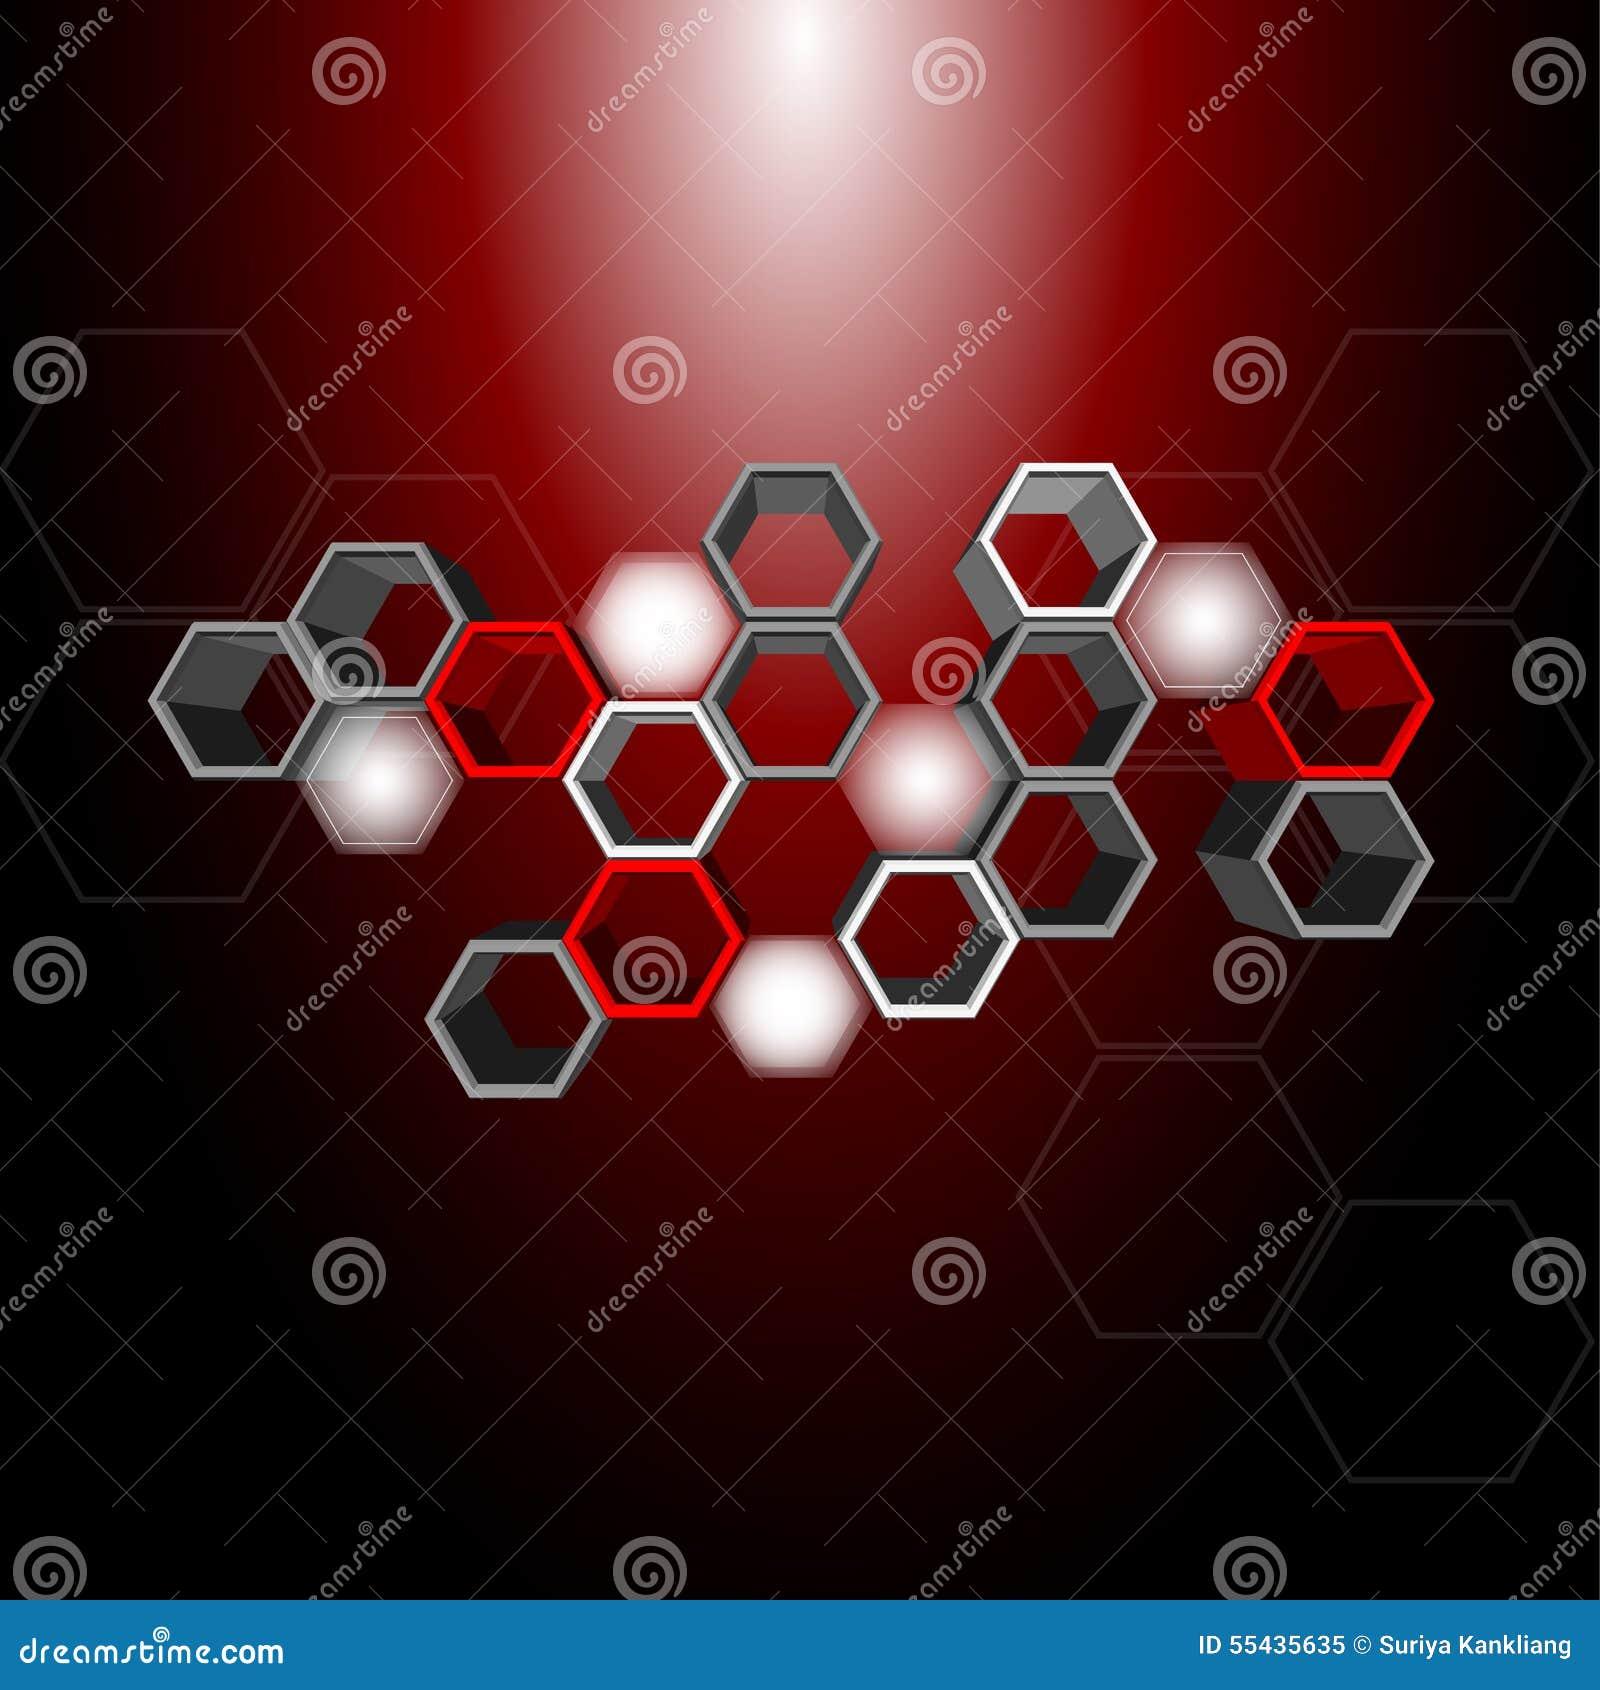 3d hexagon pattern stock vector image 54997696 - 3d Hexagon Pattern Royalty Free Stock Photo